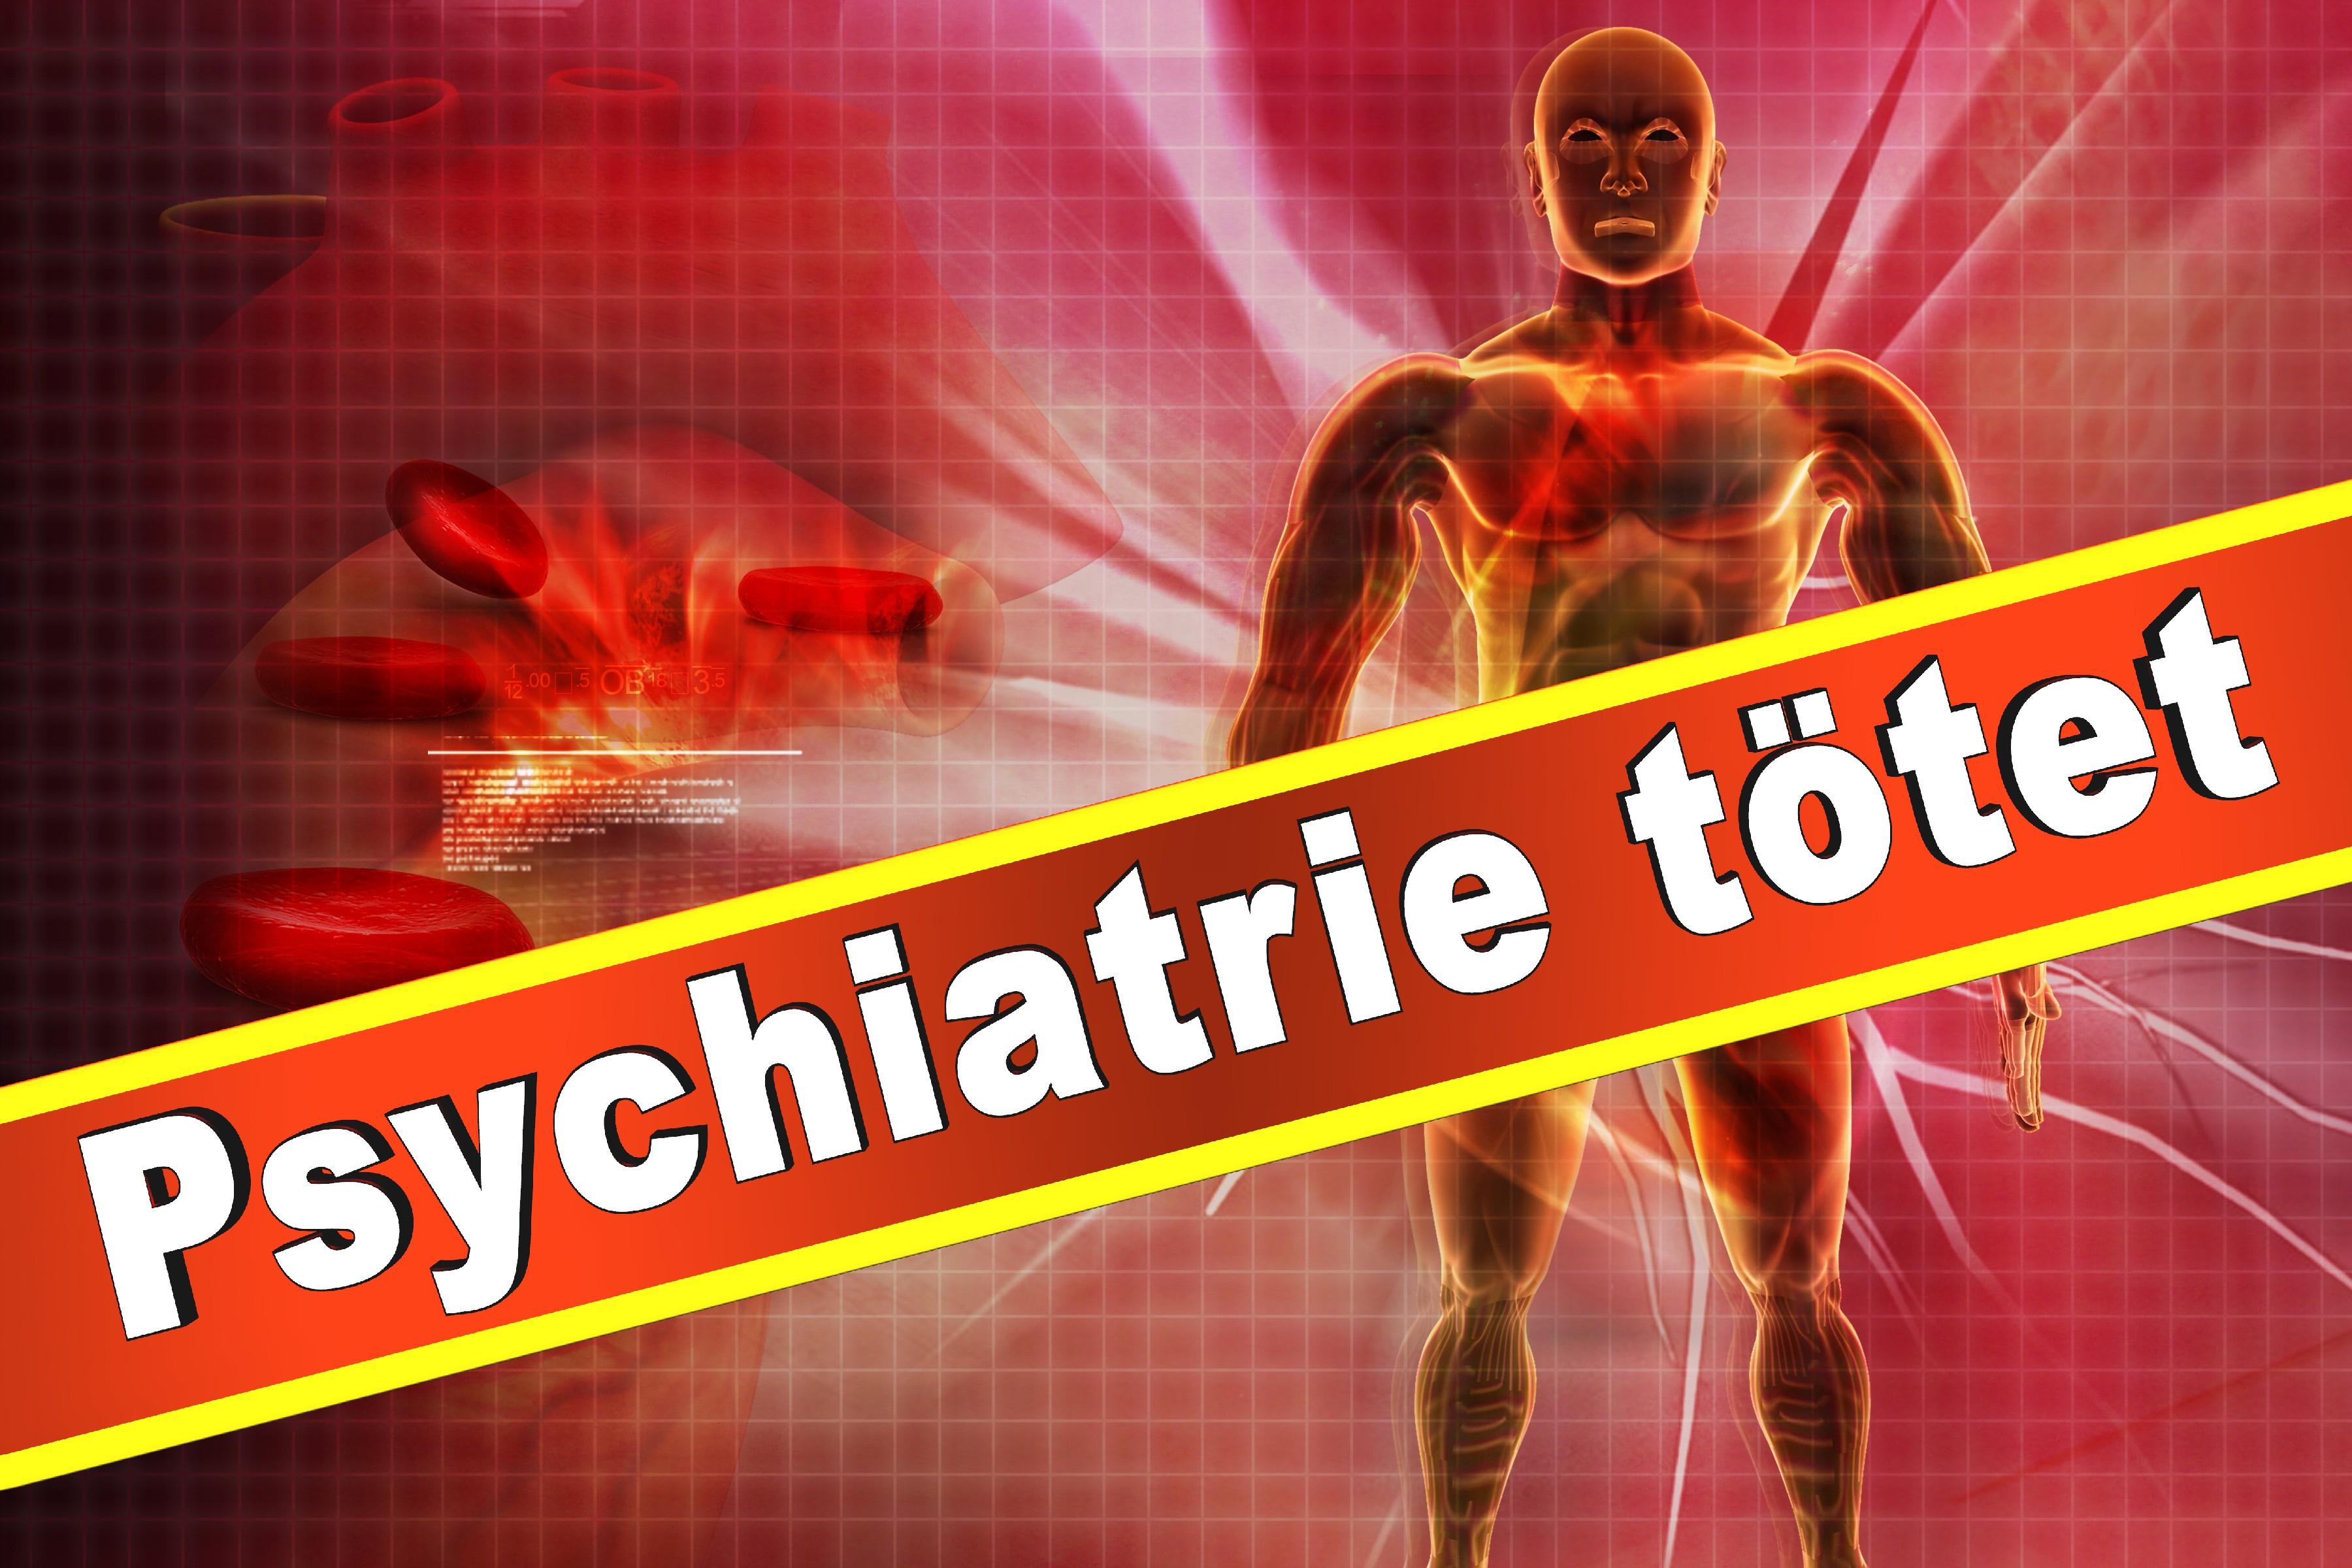 Frau Renate Cierpka Psychotherapeut Hannover Gutachten Psychiater Facharzt Psychiatrie